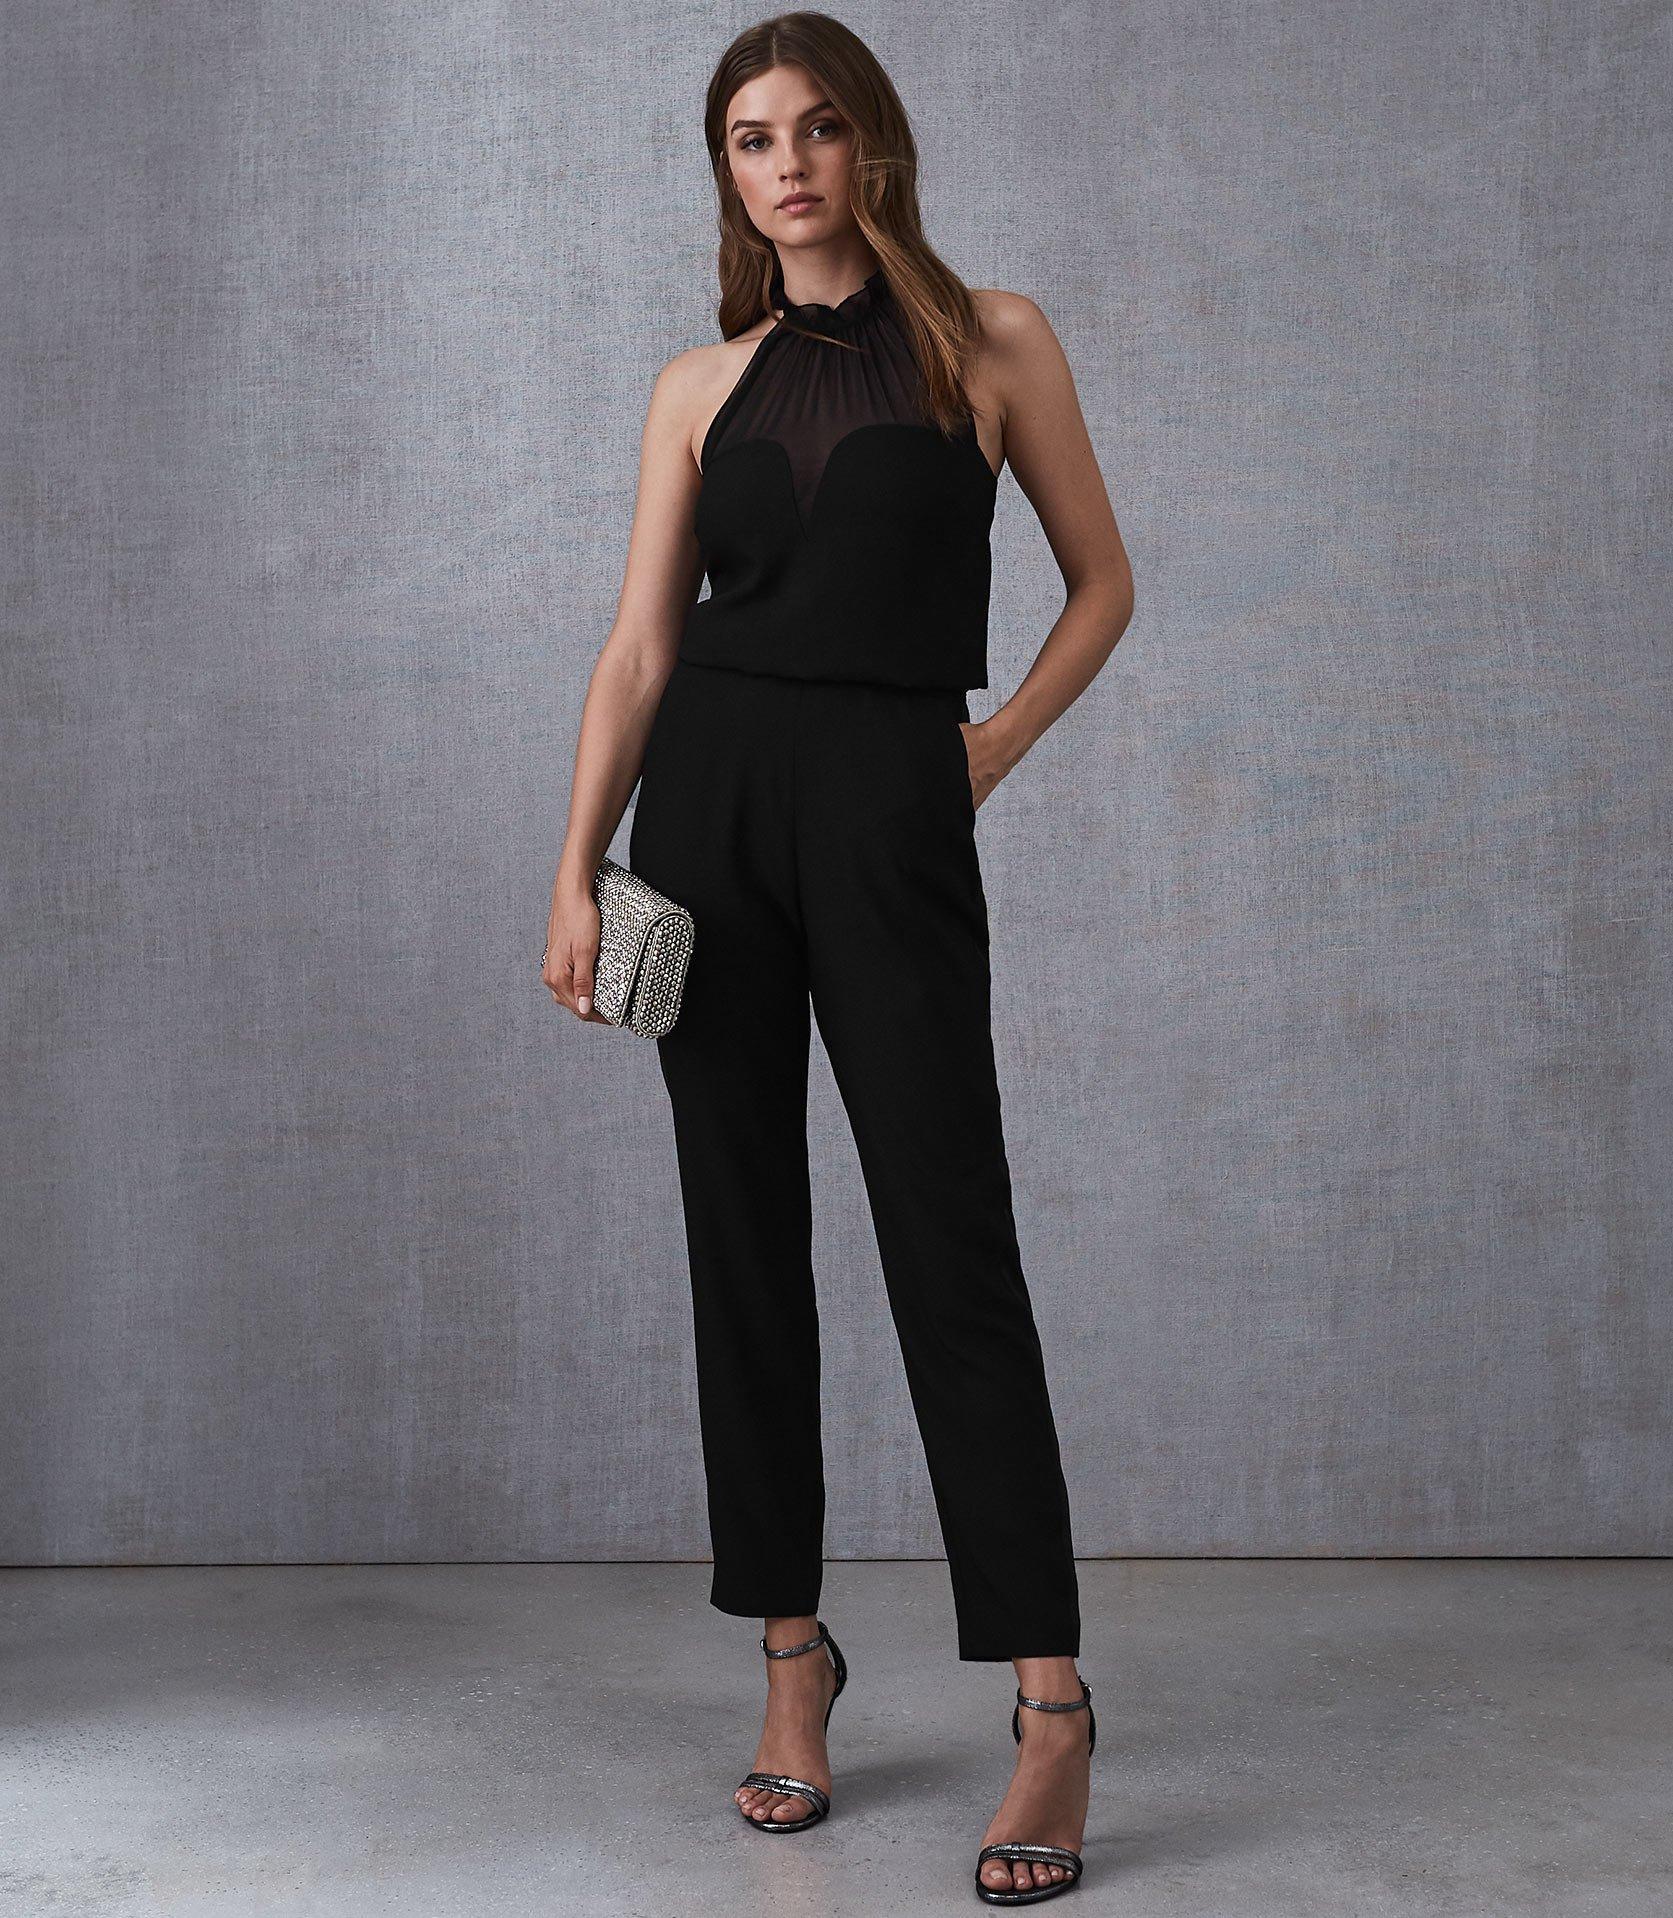 2057091c6d2 Lyst - Reiss Prisca - Halterneck Jumpsuit in Black